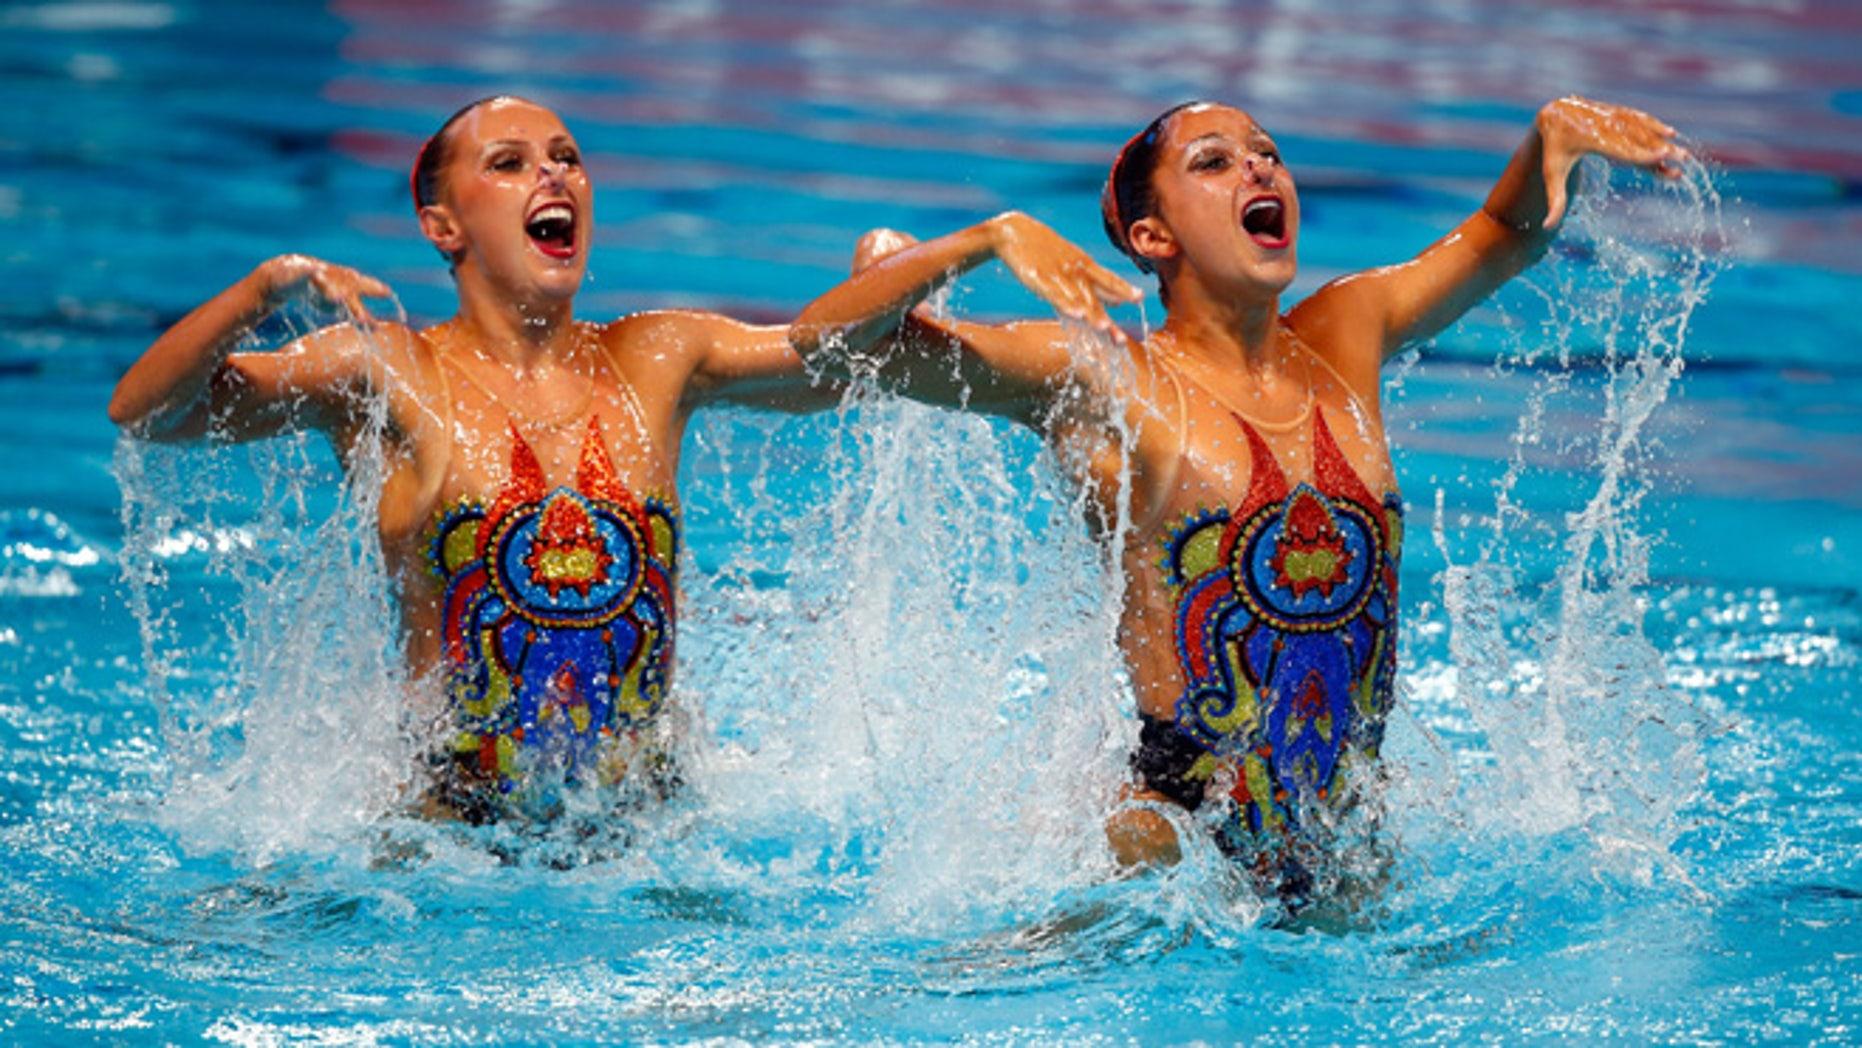 Anita Alvarez and Mariya Koroleva on July 30, 2015 in Kazan, Russia.